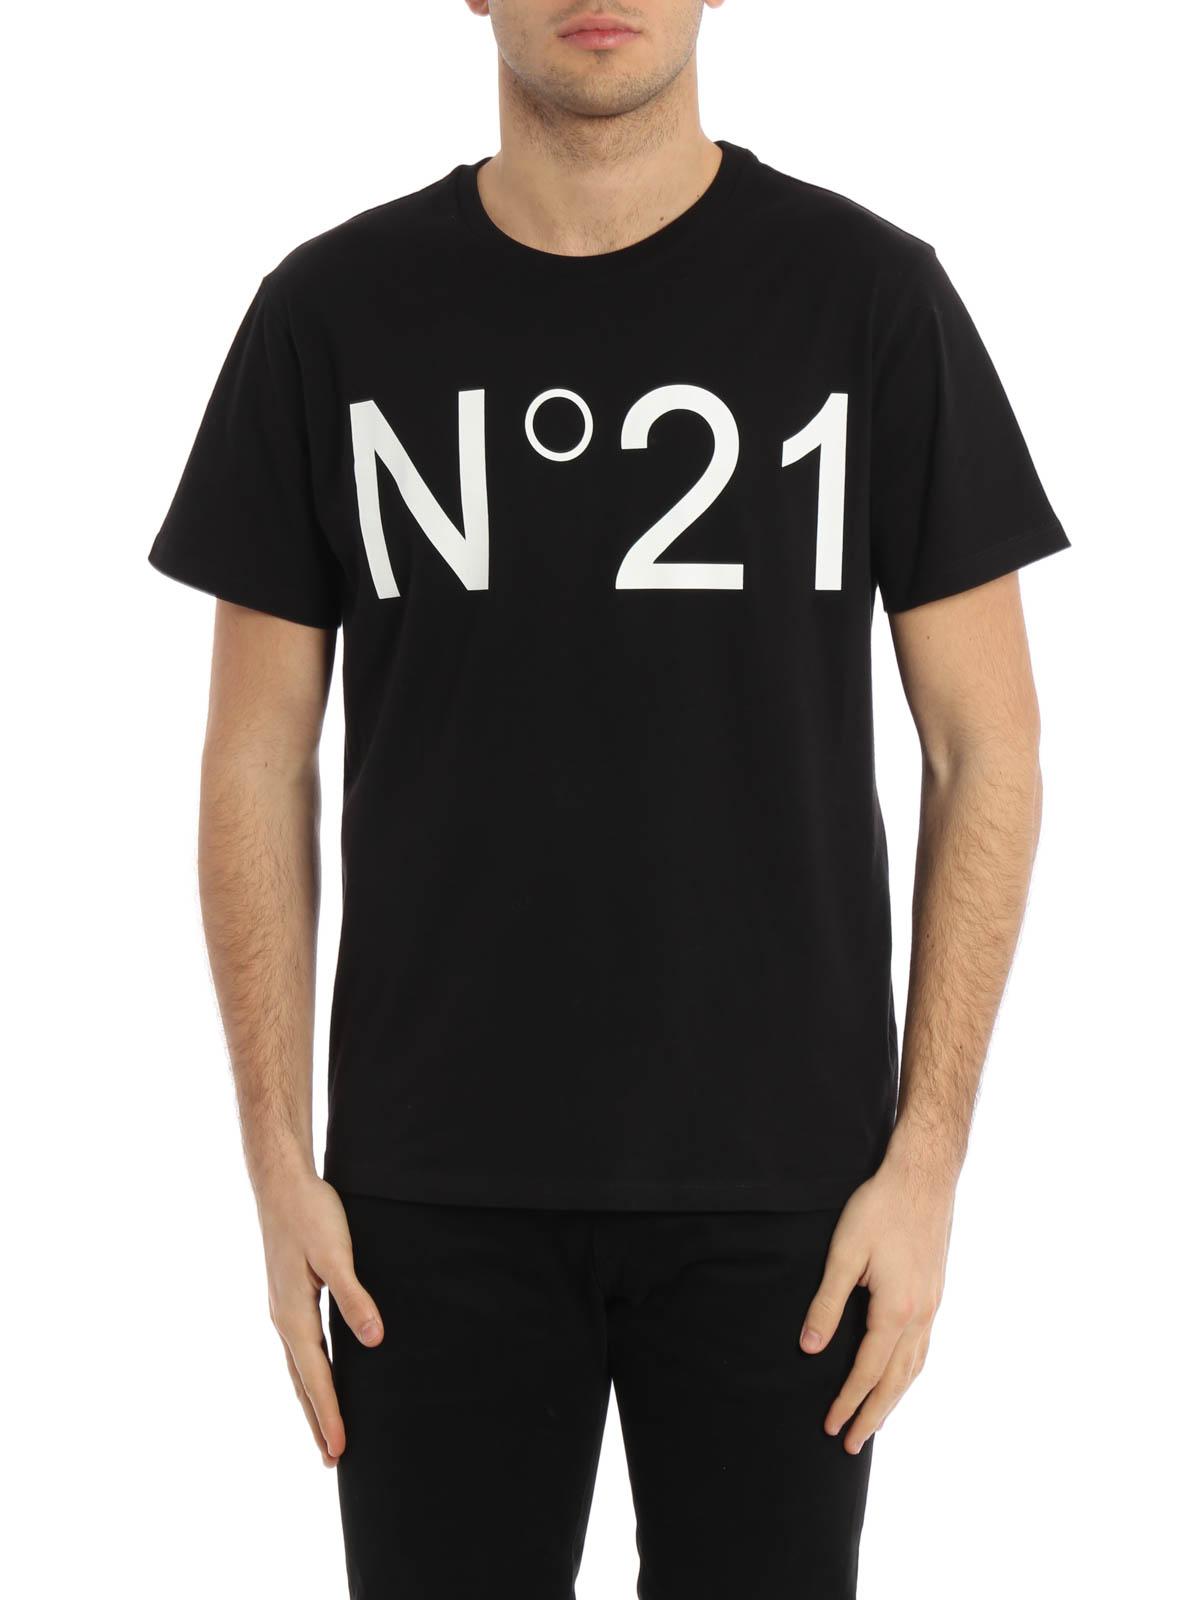 N 21 T Shirt Fur Herren Schwarz T Shirts F02163659000